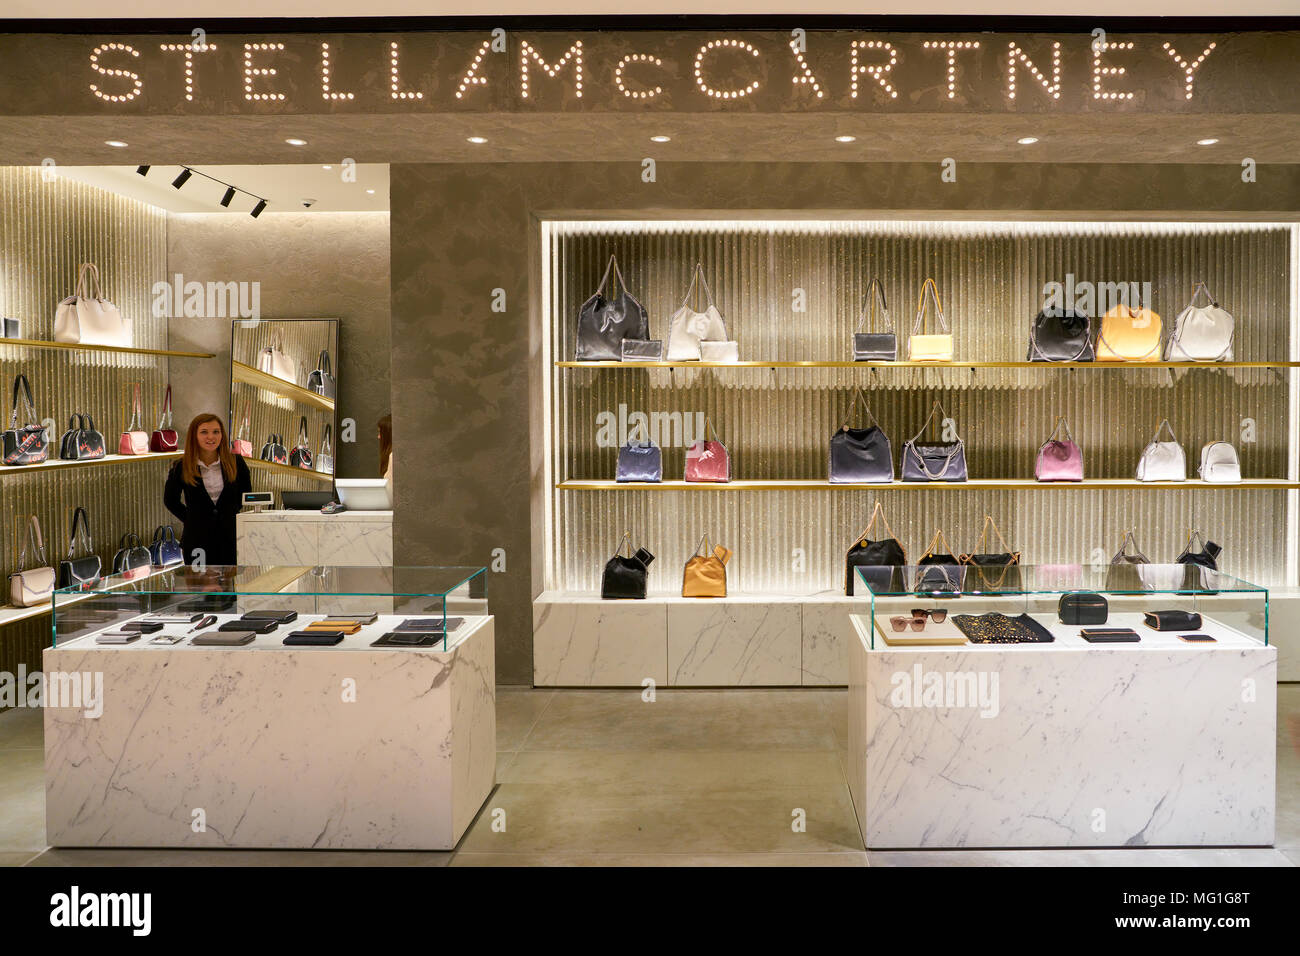 03c081d5d4422d Stella Mccartney Fashion Store Stockfotos   Stella Mccartney Fashion ...